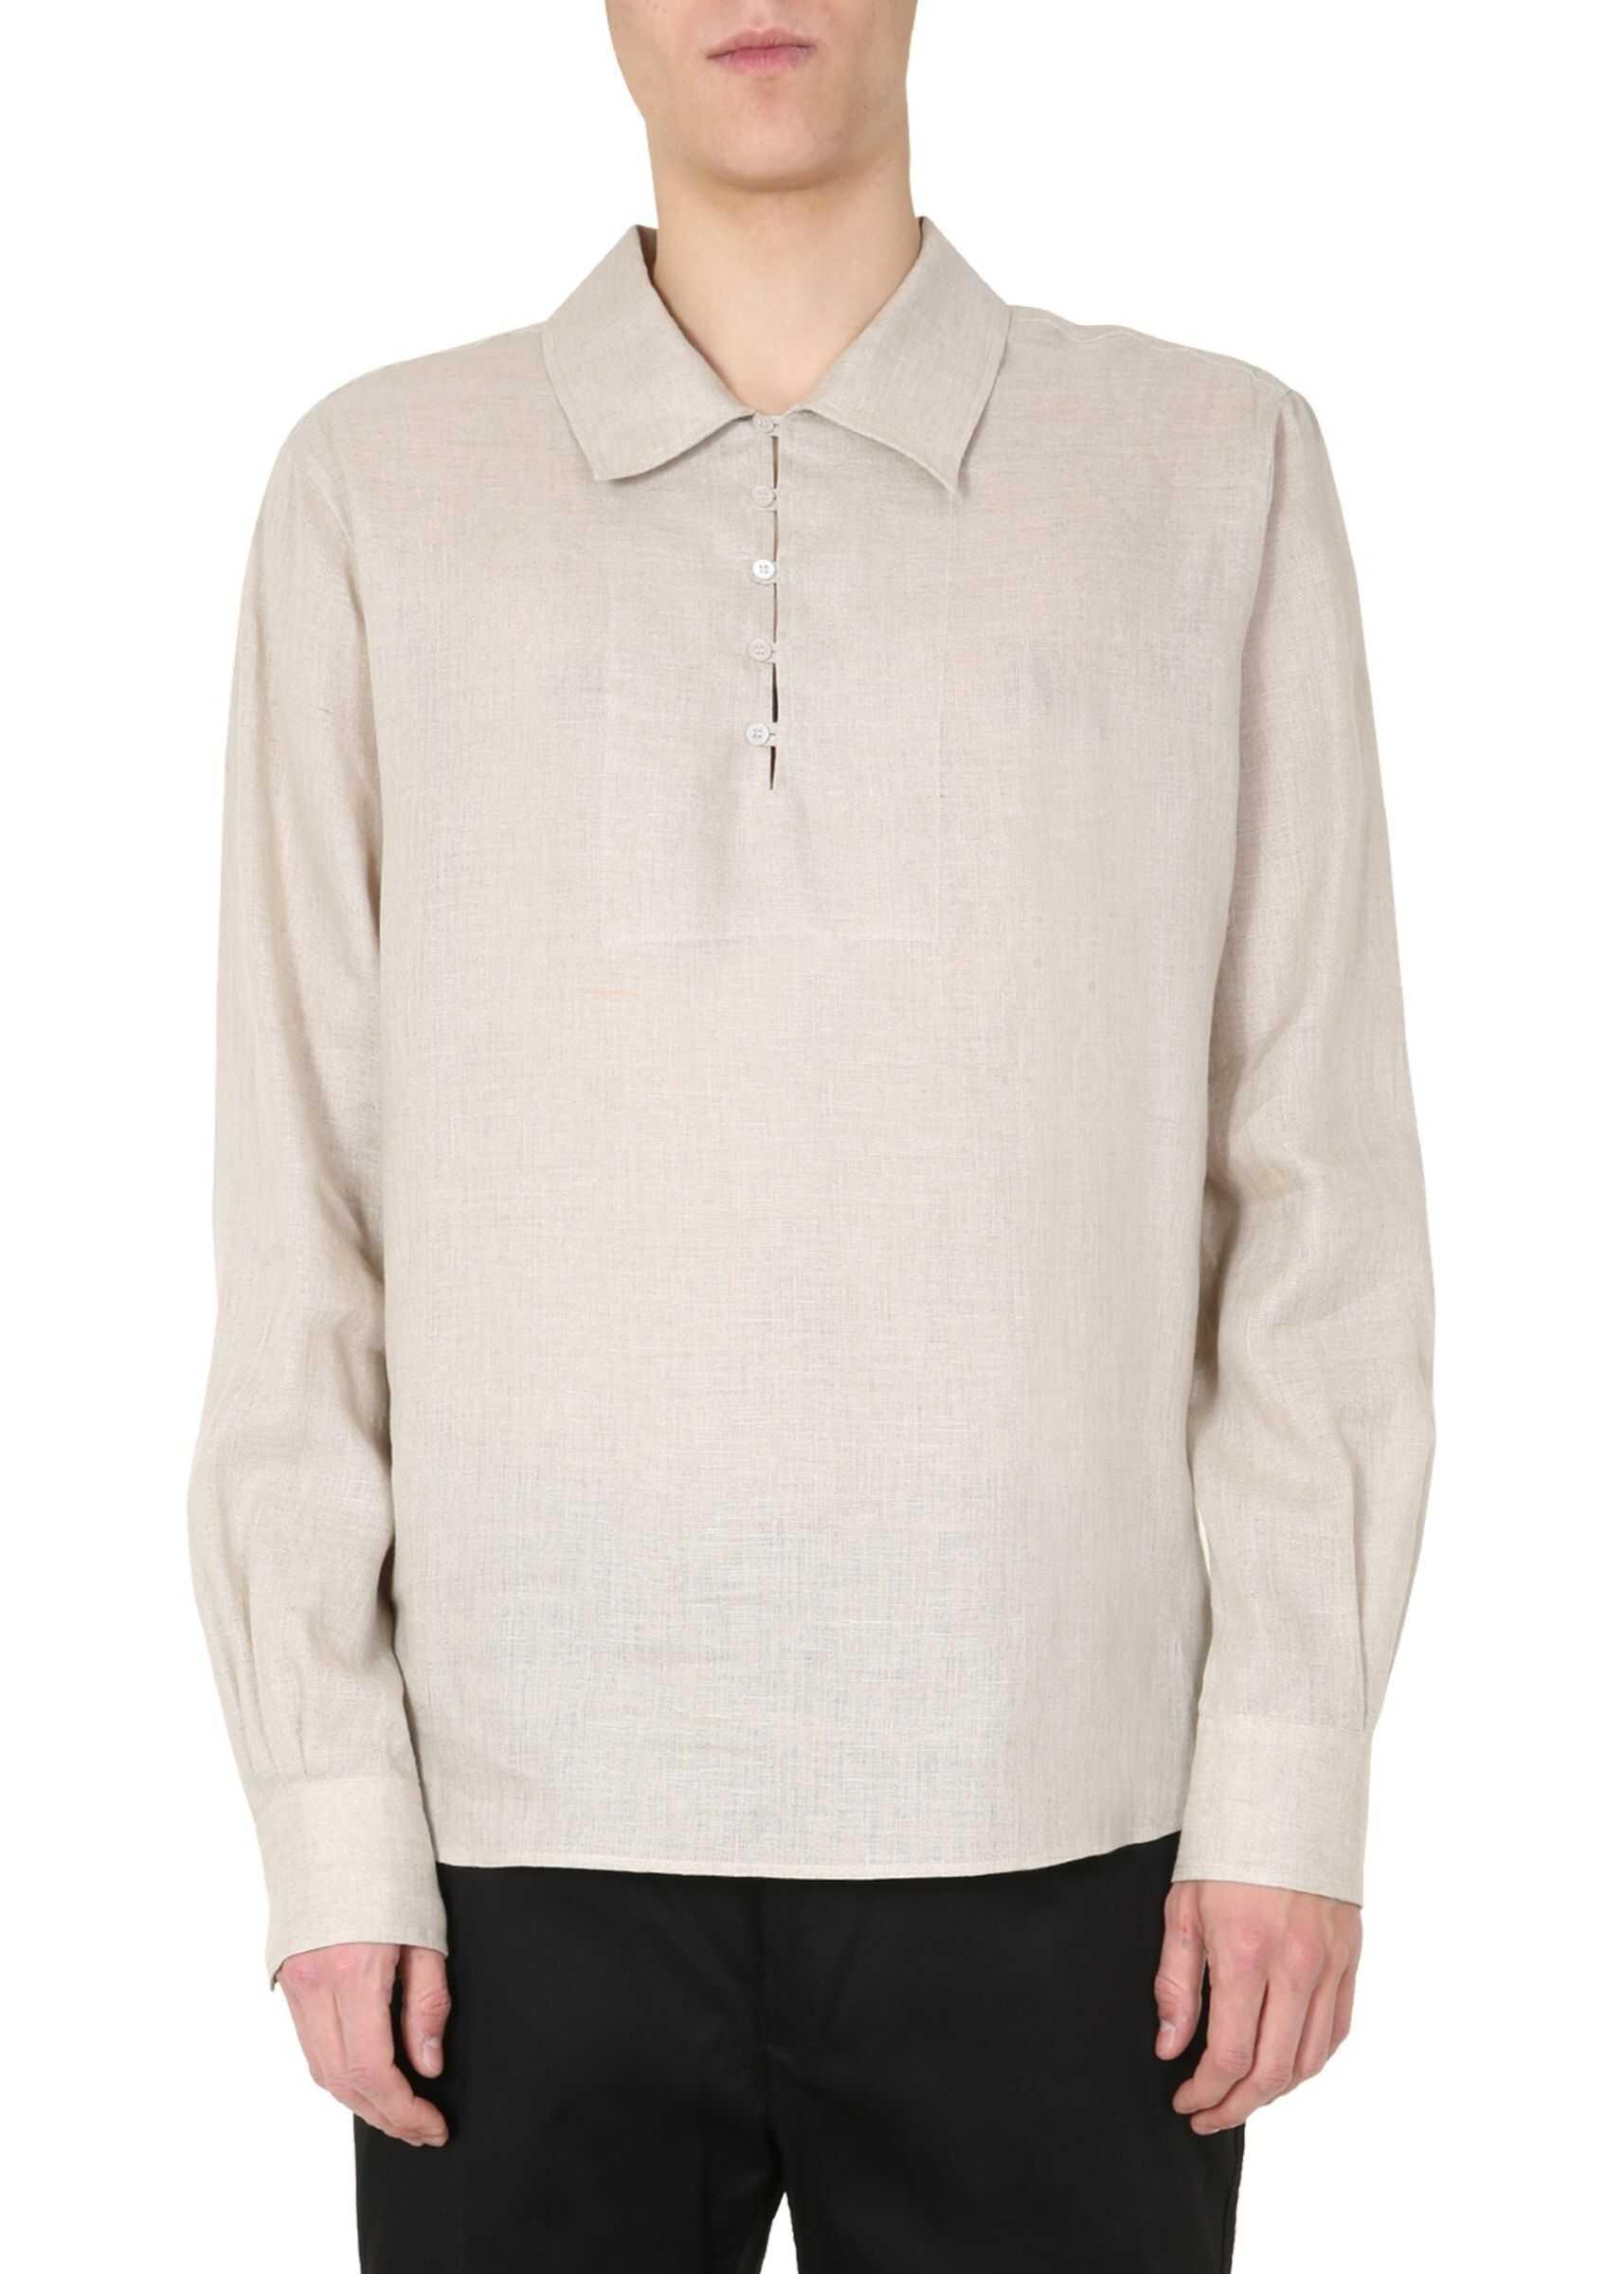 Dolce & Gabbana Oversize Fit Shirt POWDER